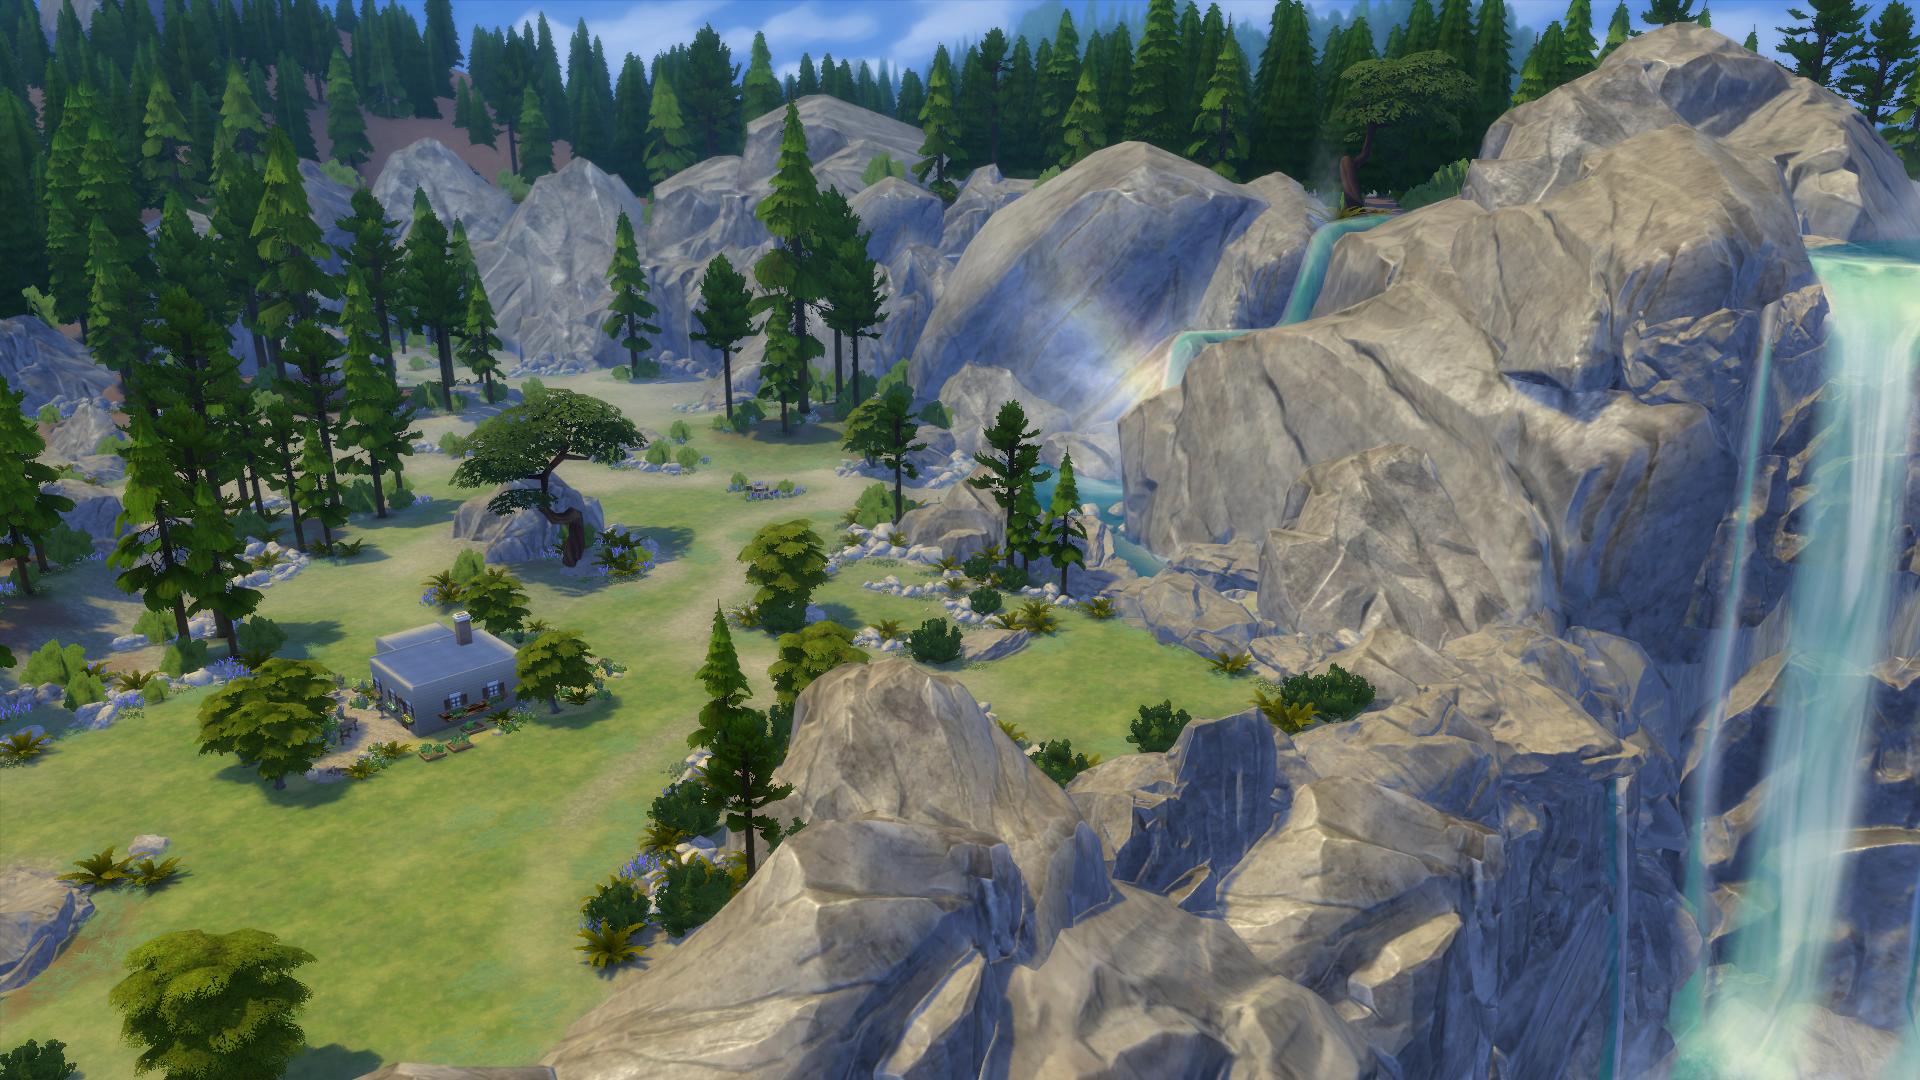 Find The Hermit Of Granite Falls In The Sims 4 Outdoor Retreat's Deep Woods  Hidden Area